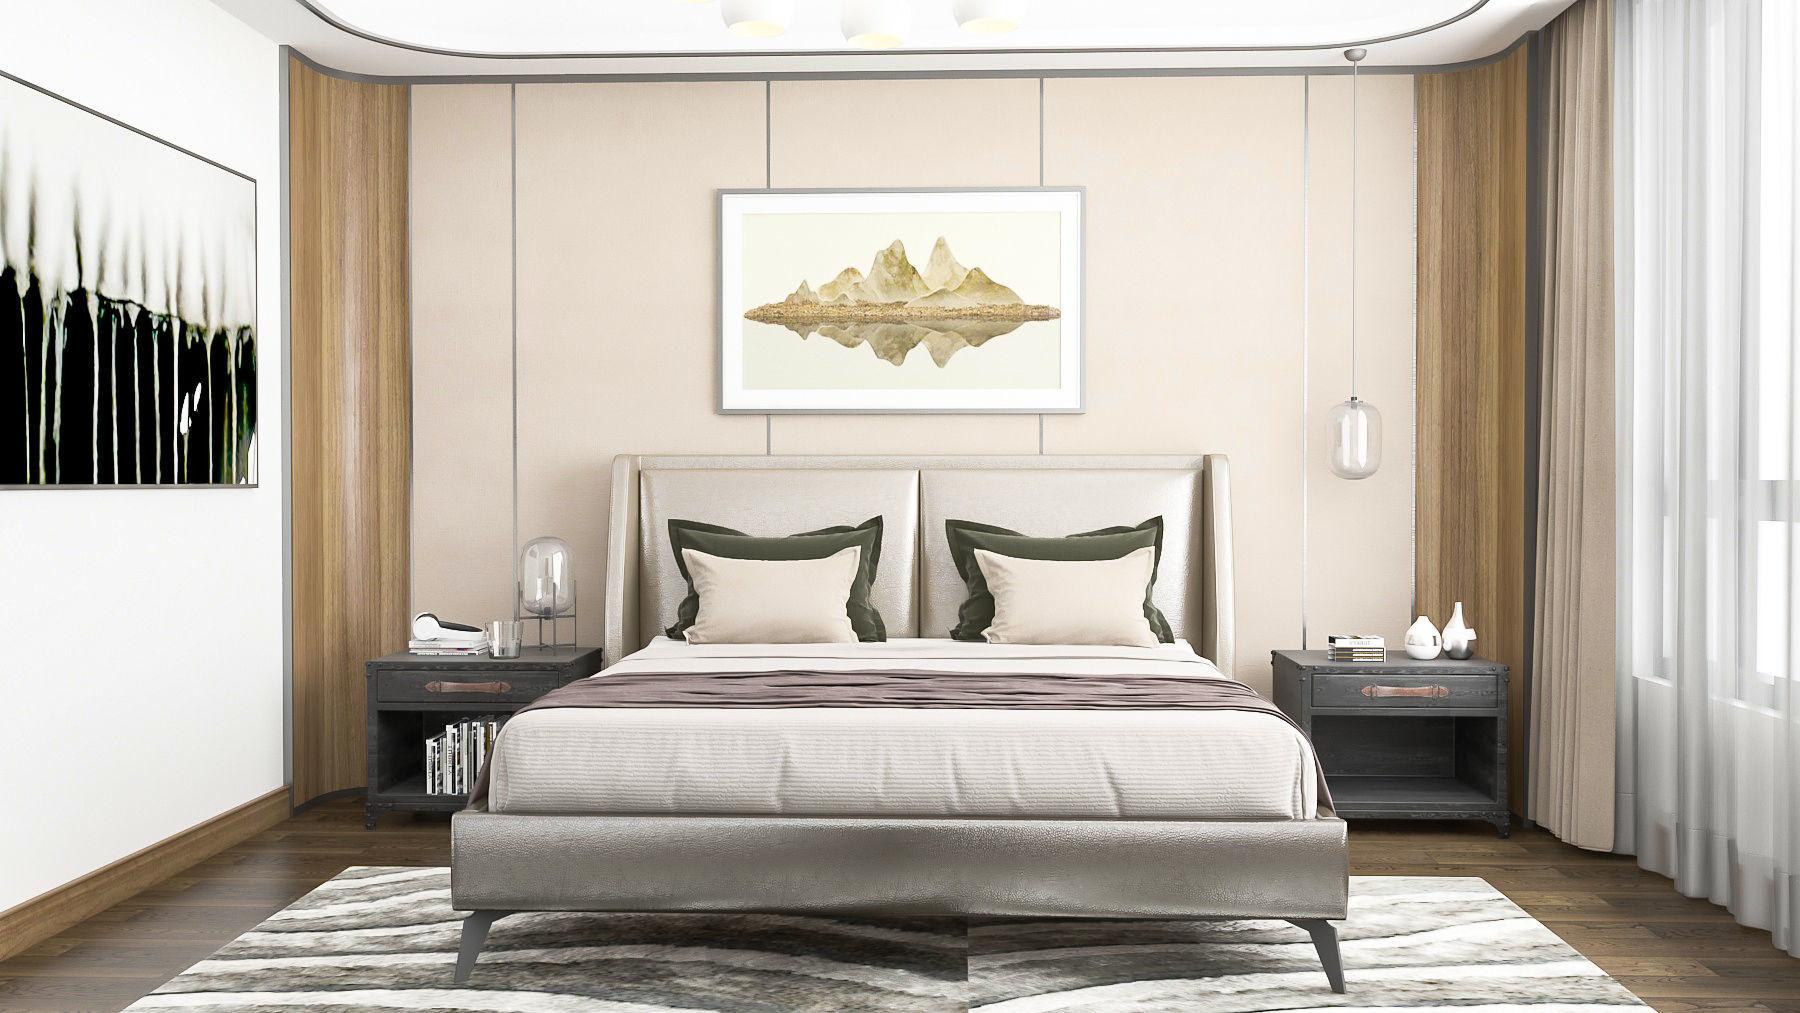 Bedroom interior Design VRay Render 3D model MAX FBX on Model Bedroom Interior Design  id=68009